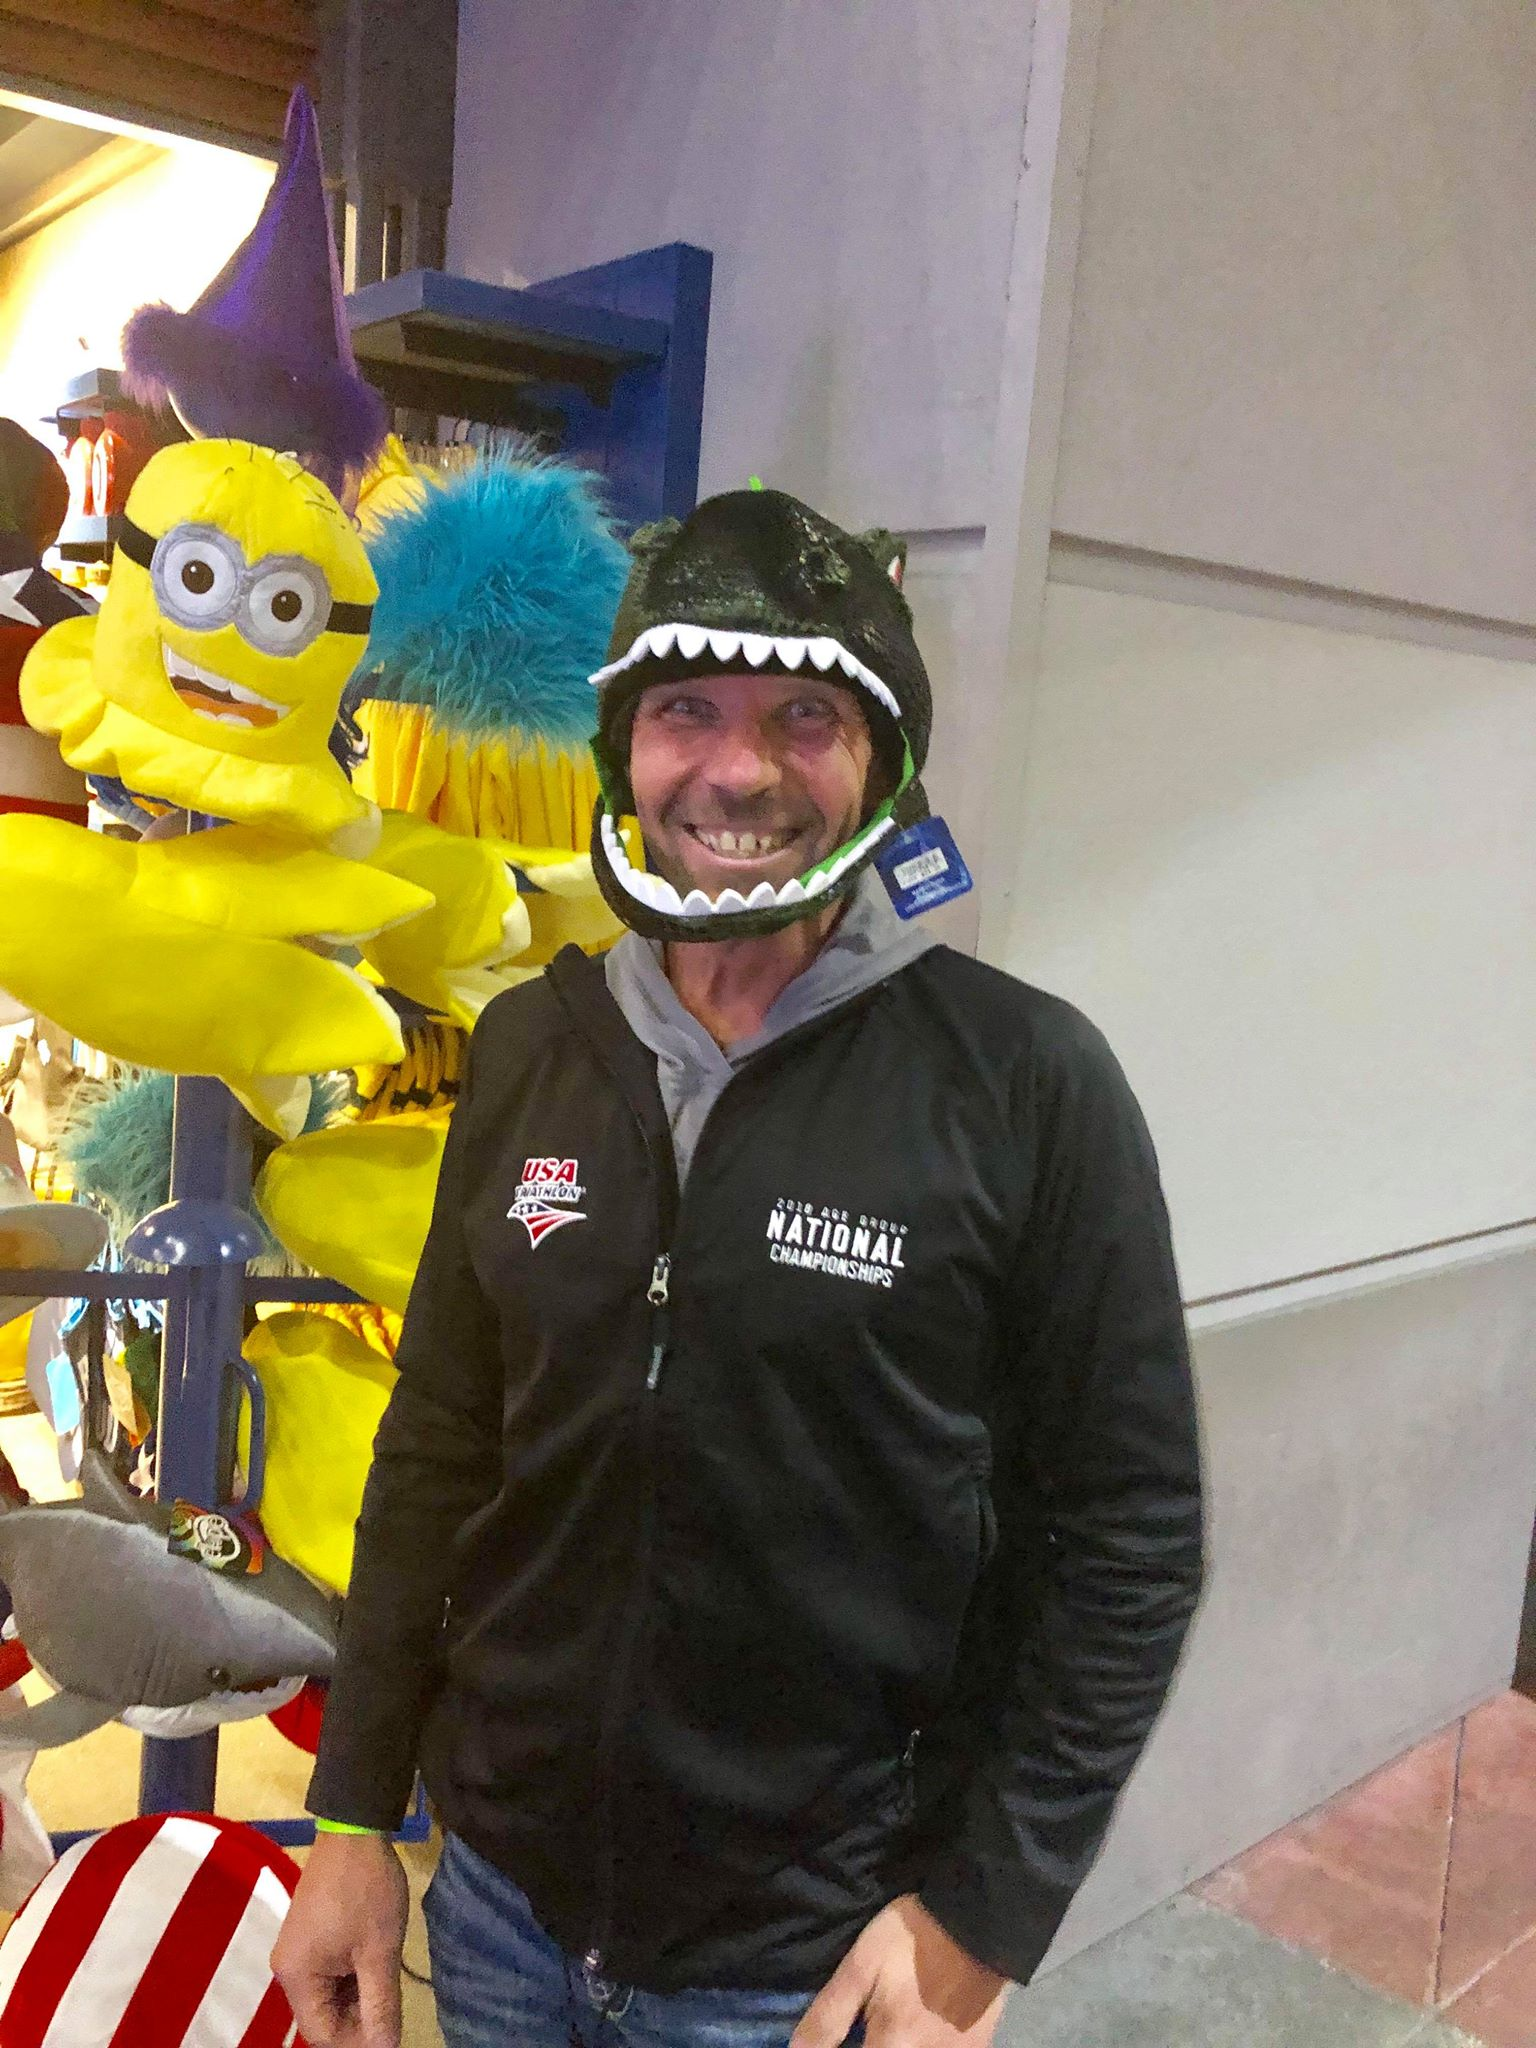 Coach_Terry_Wilson_Pursuit_of_The_Perfect_Race_Ultraman_Florida_Chris_Pollack_4.jpg